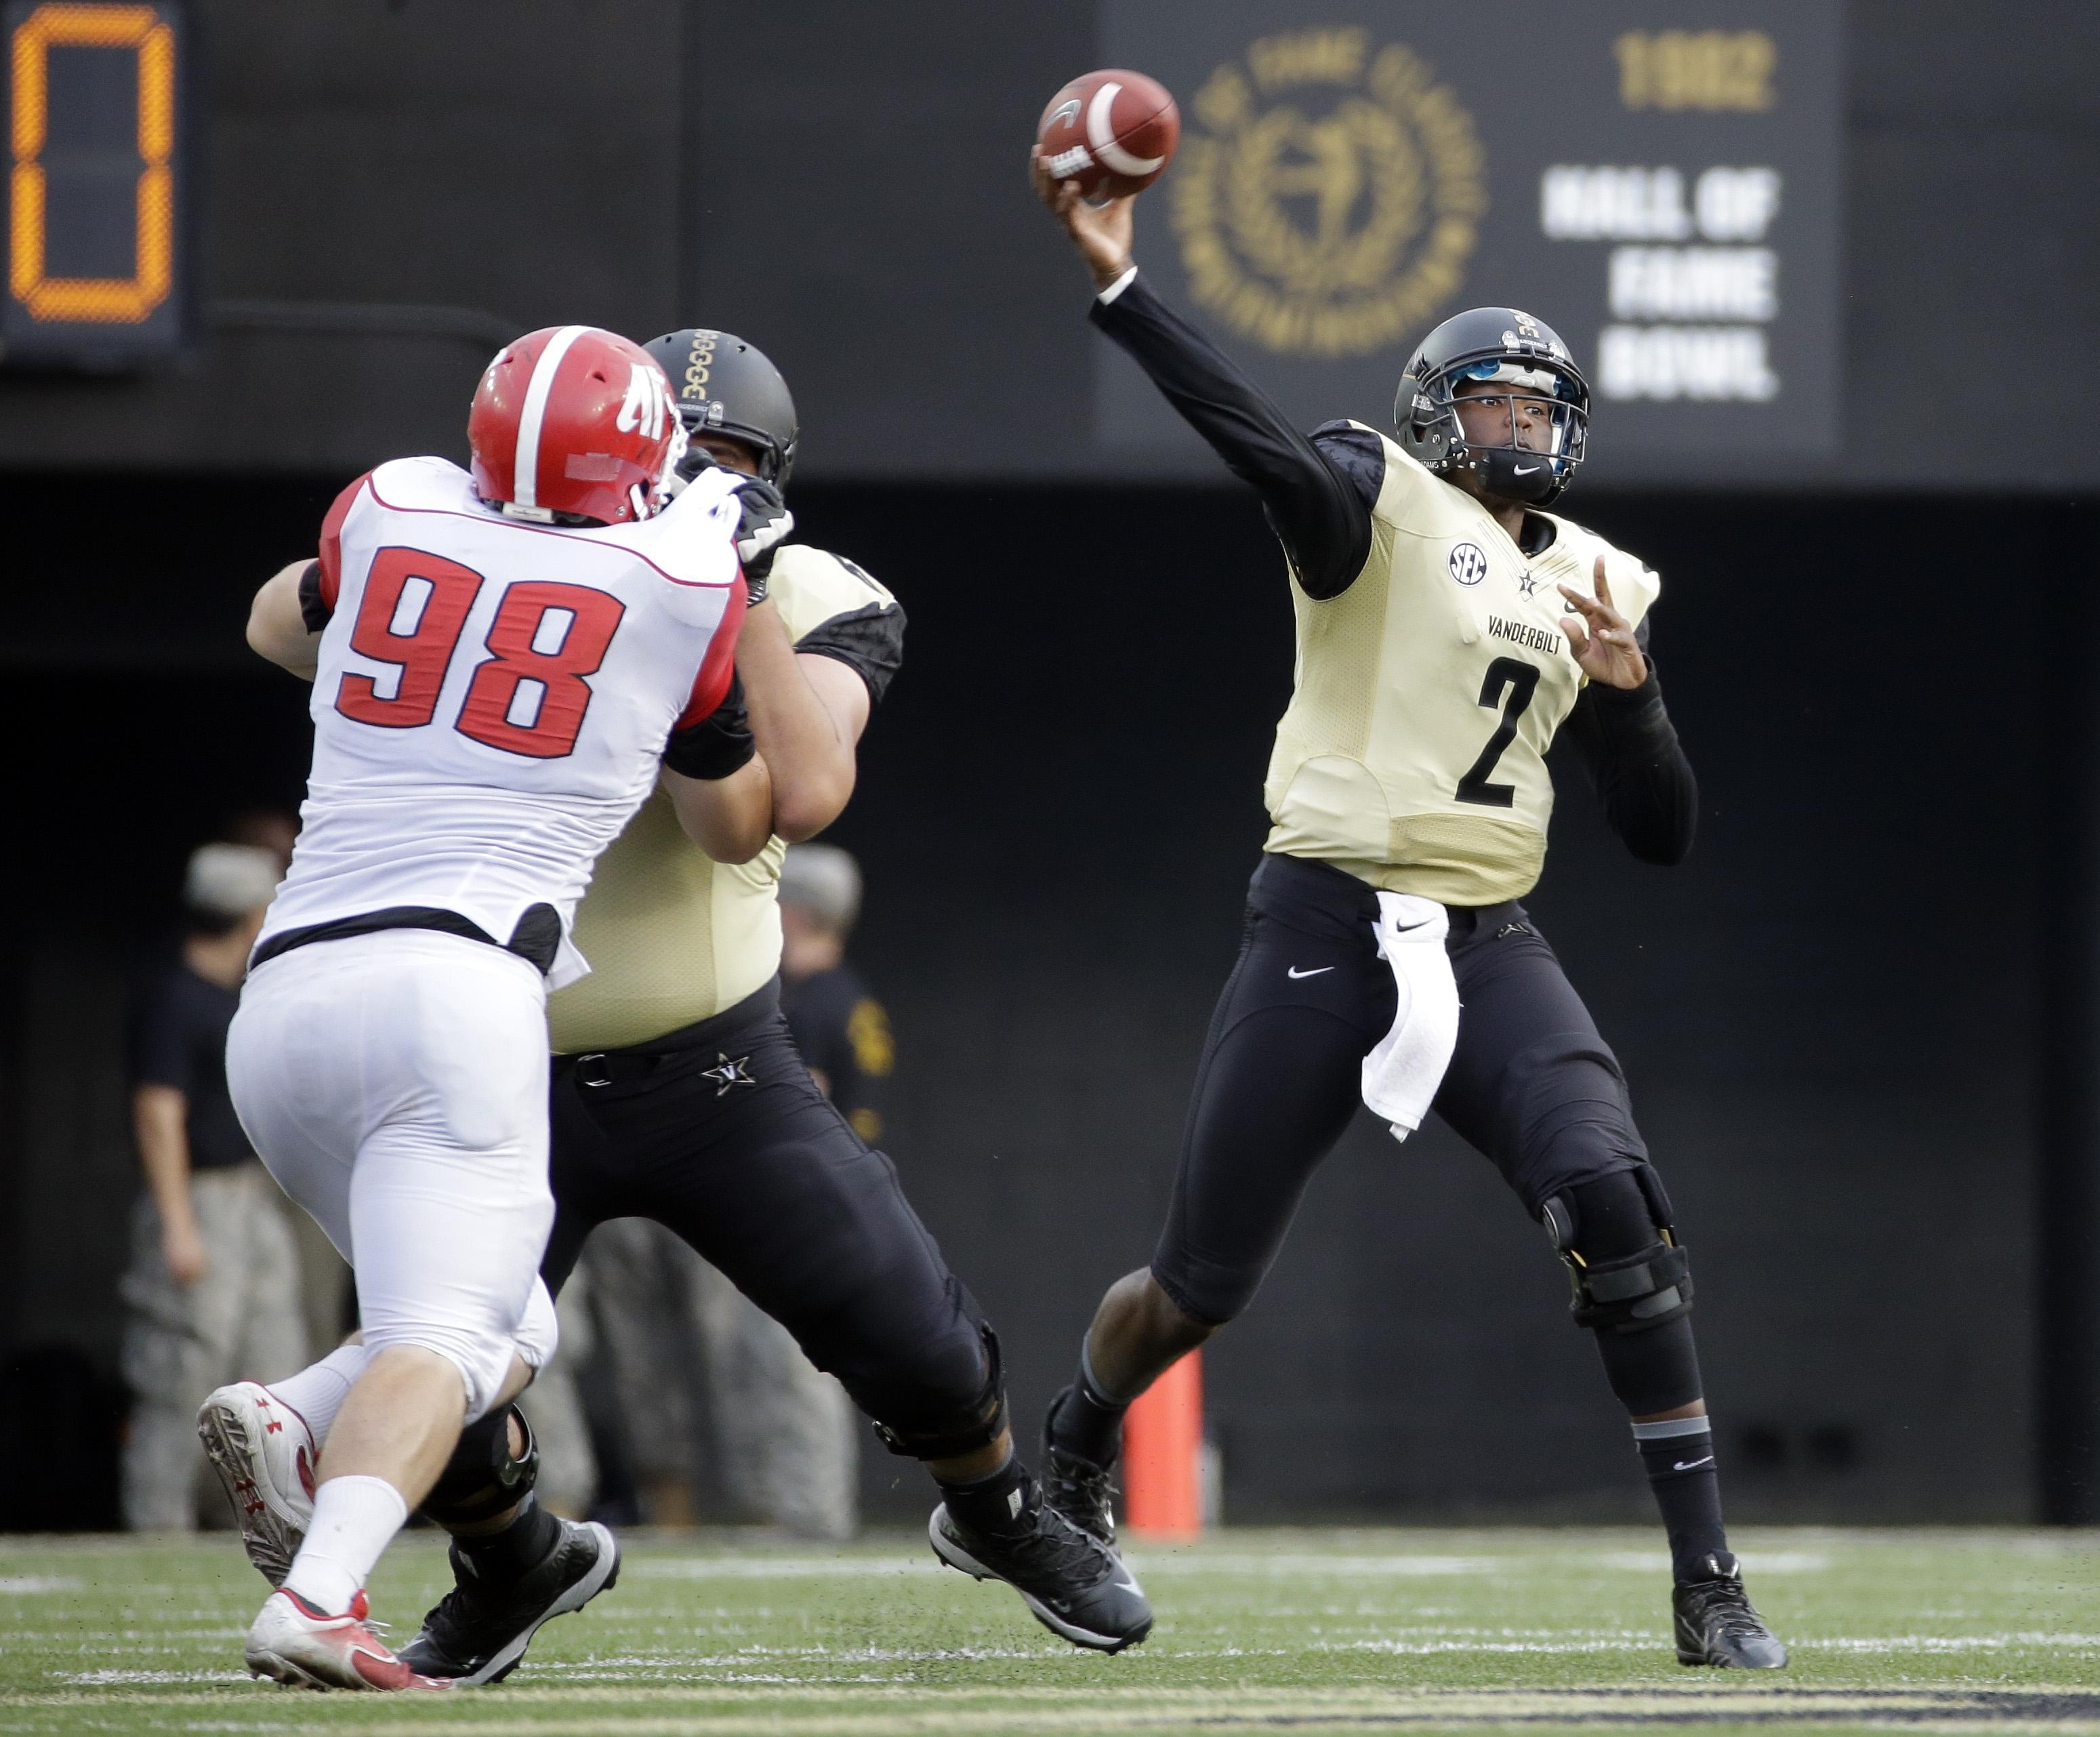 Vanderbilt quarterback Johnny McCrary (2) passes as Austin Peay defensive tackle Branden Johnson (98) rushes in the second half of an NCAA college football game, Saturday, Sept. 19, 2015, in Nashville, Tenn. Vanderbilt won 47-7. (AP Photo/Mark Humphrey)